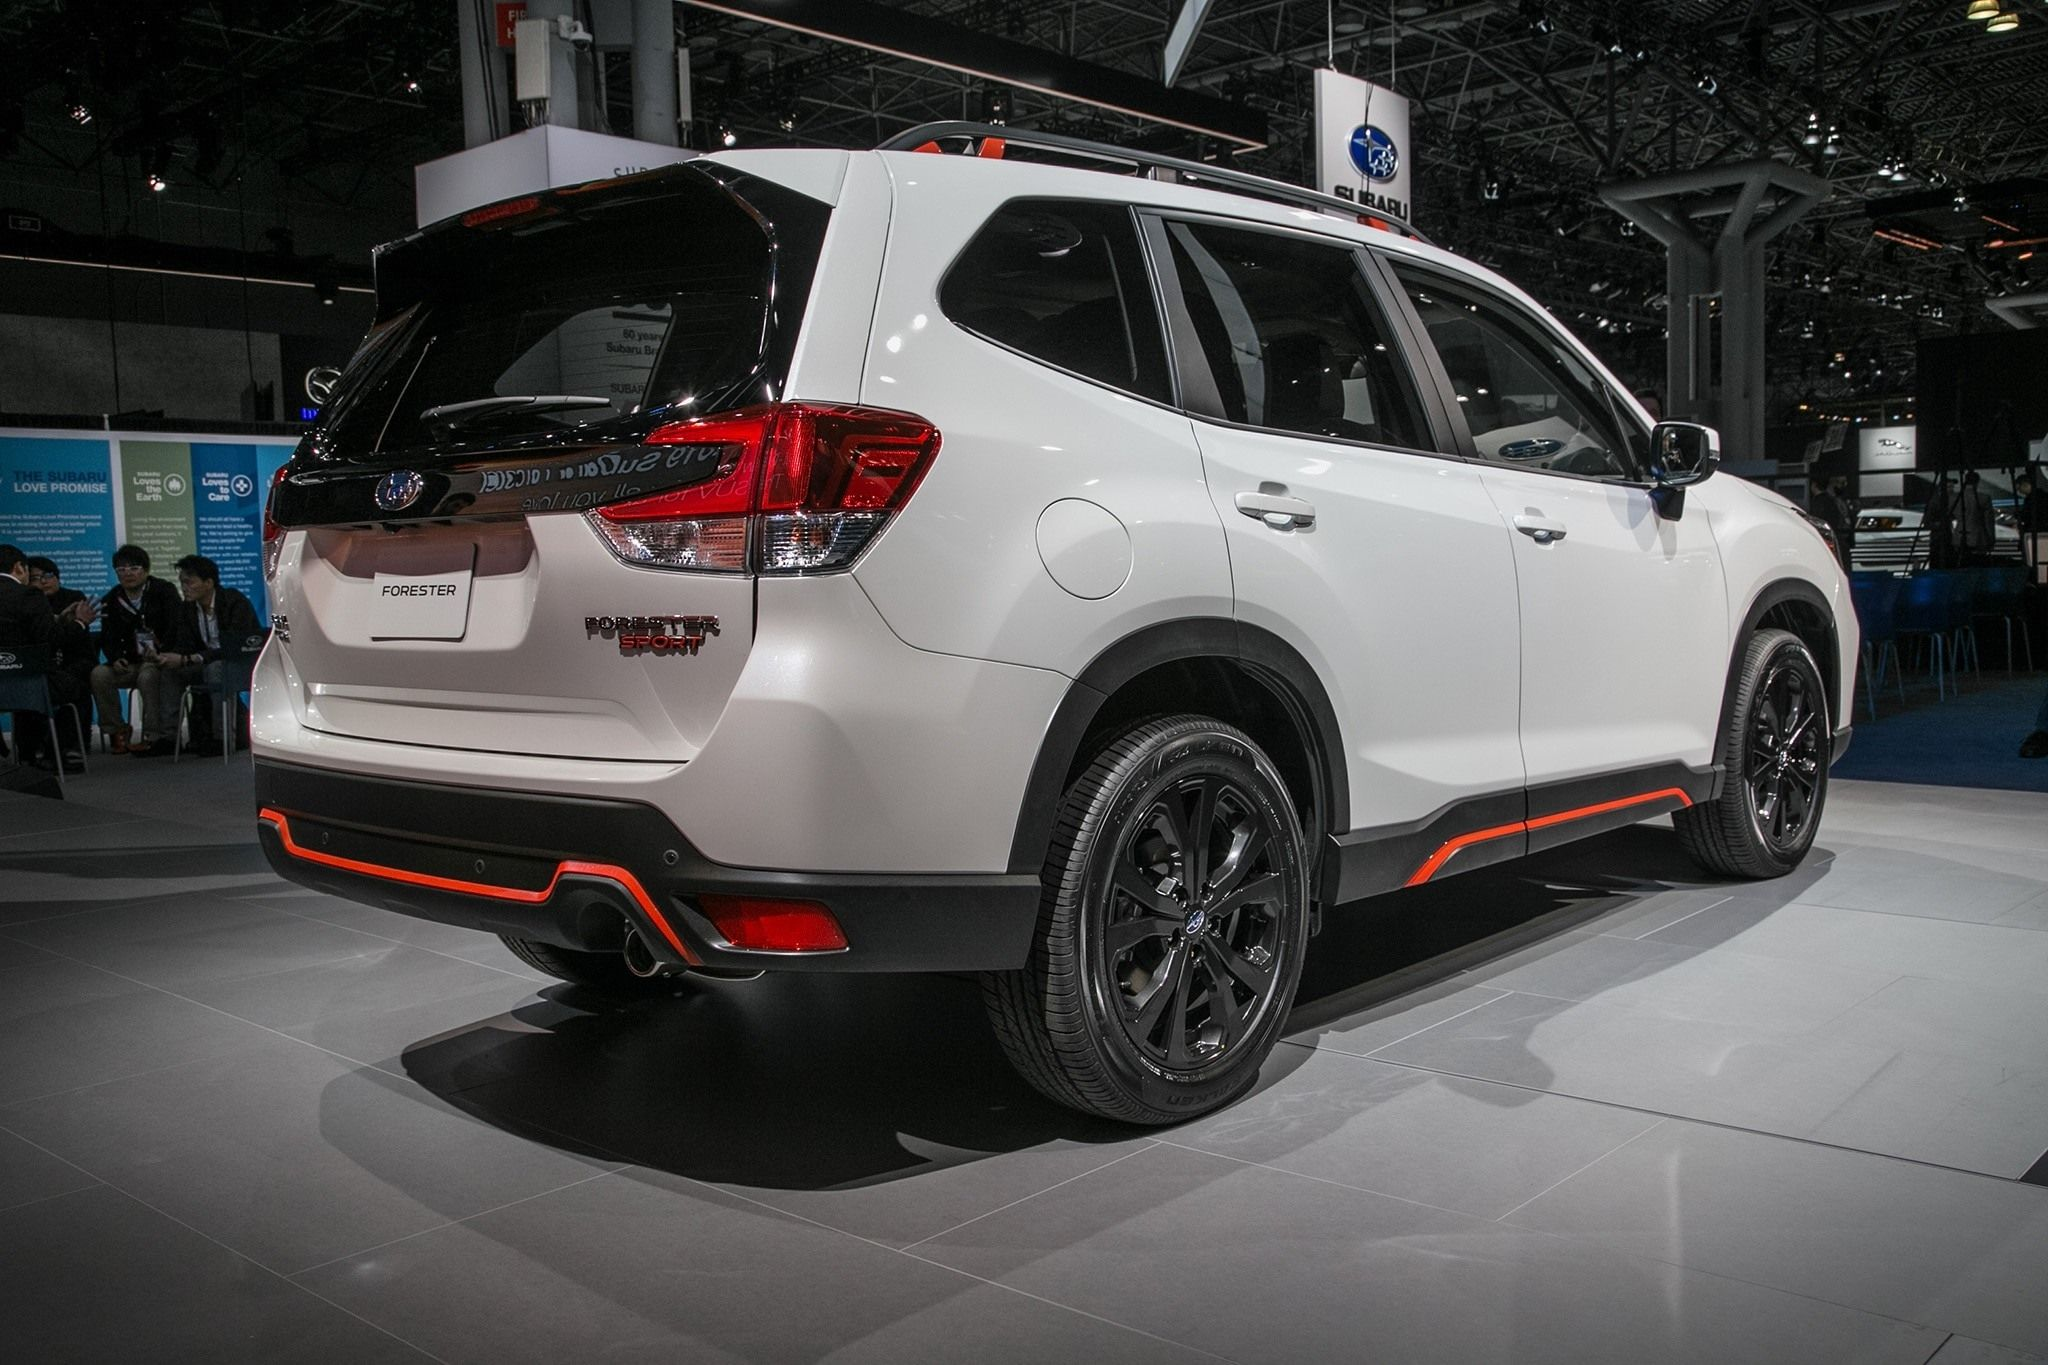 2019 Subaru Xt Premium New Review Review Car 2018 Pinterest